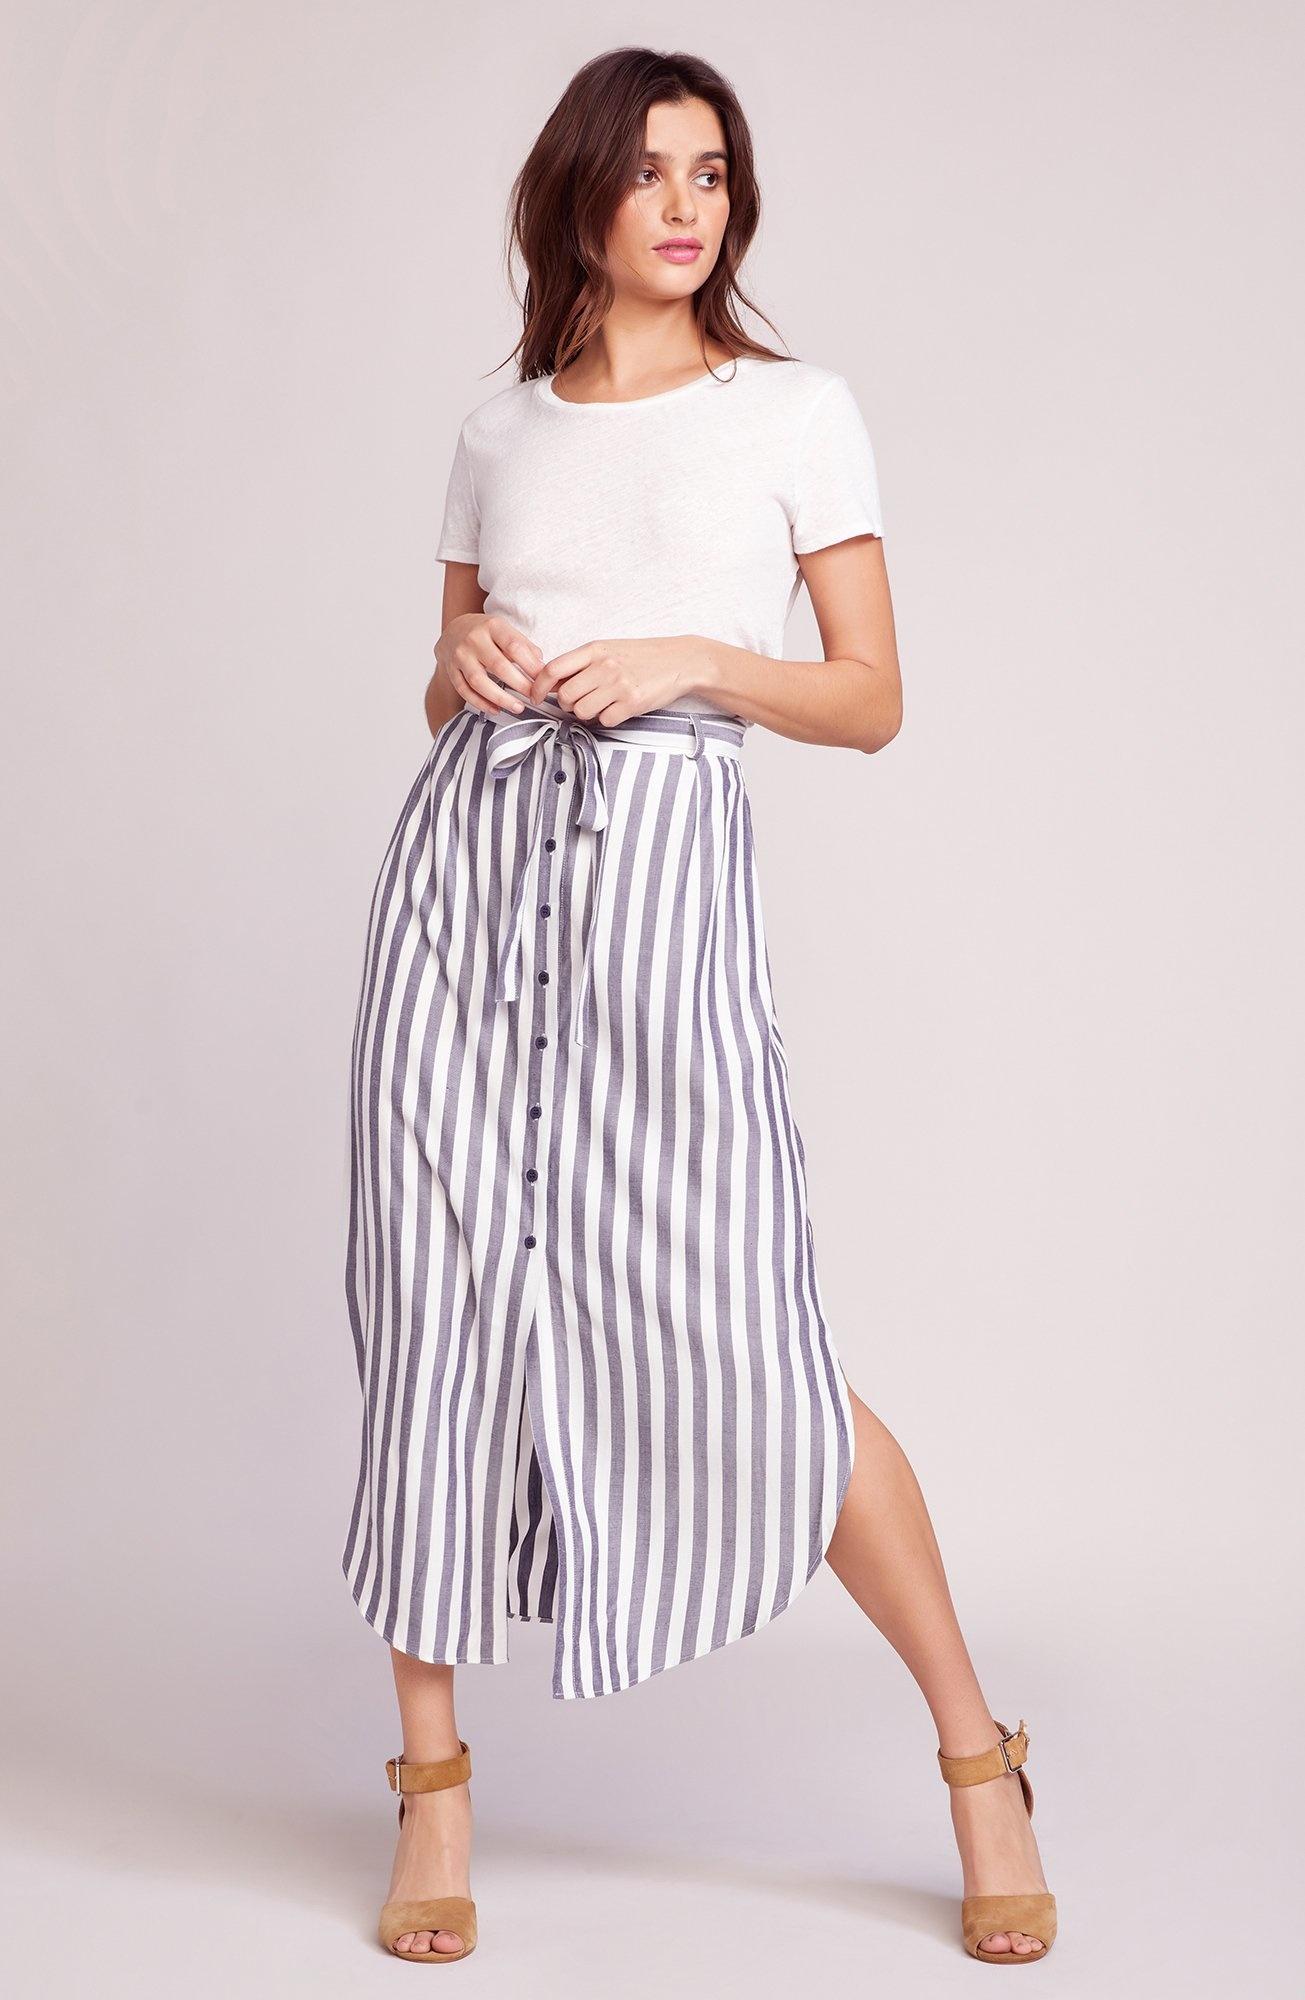 BB Dakota Stripe I Like Skirt